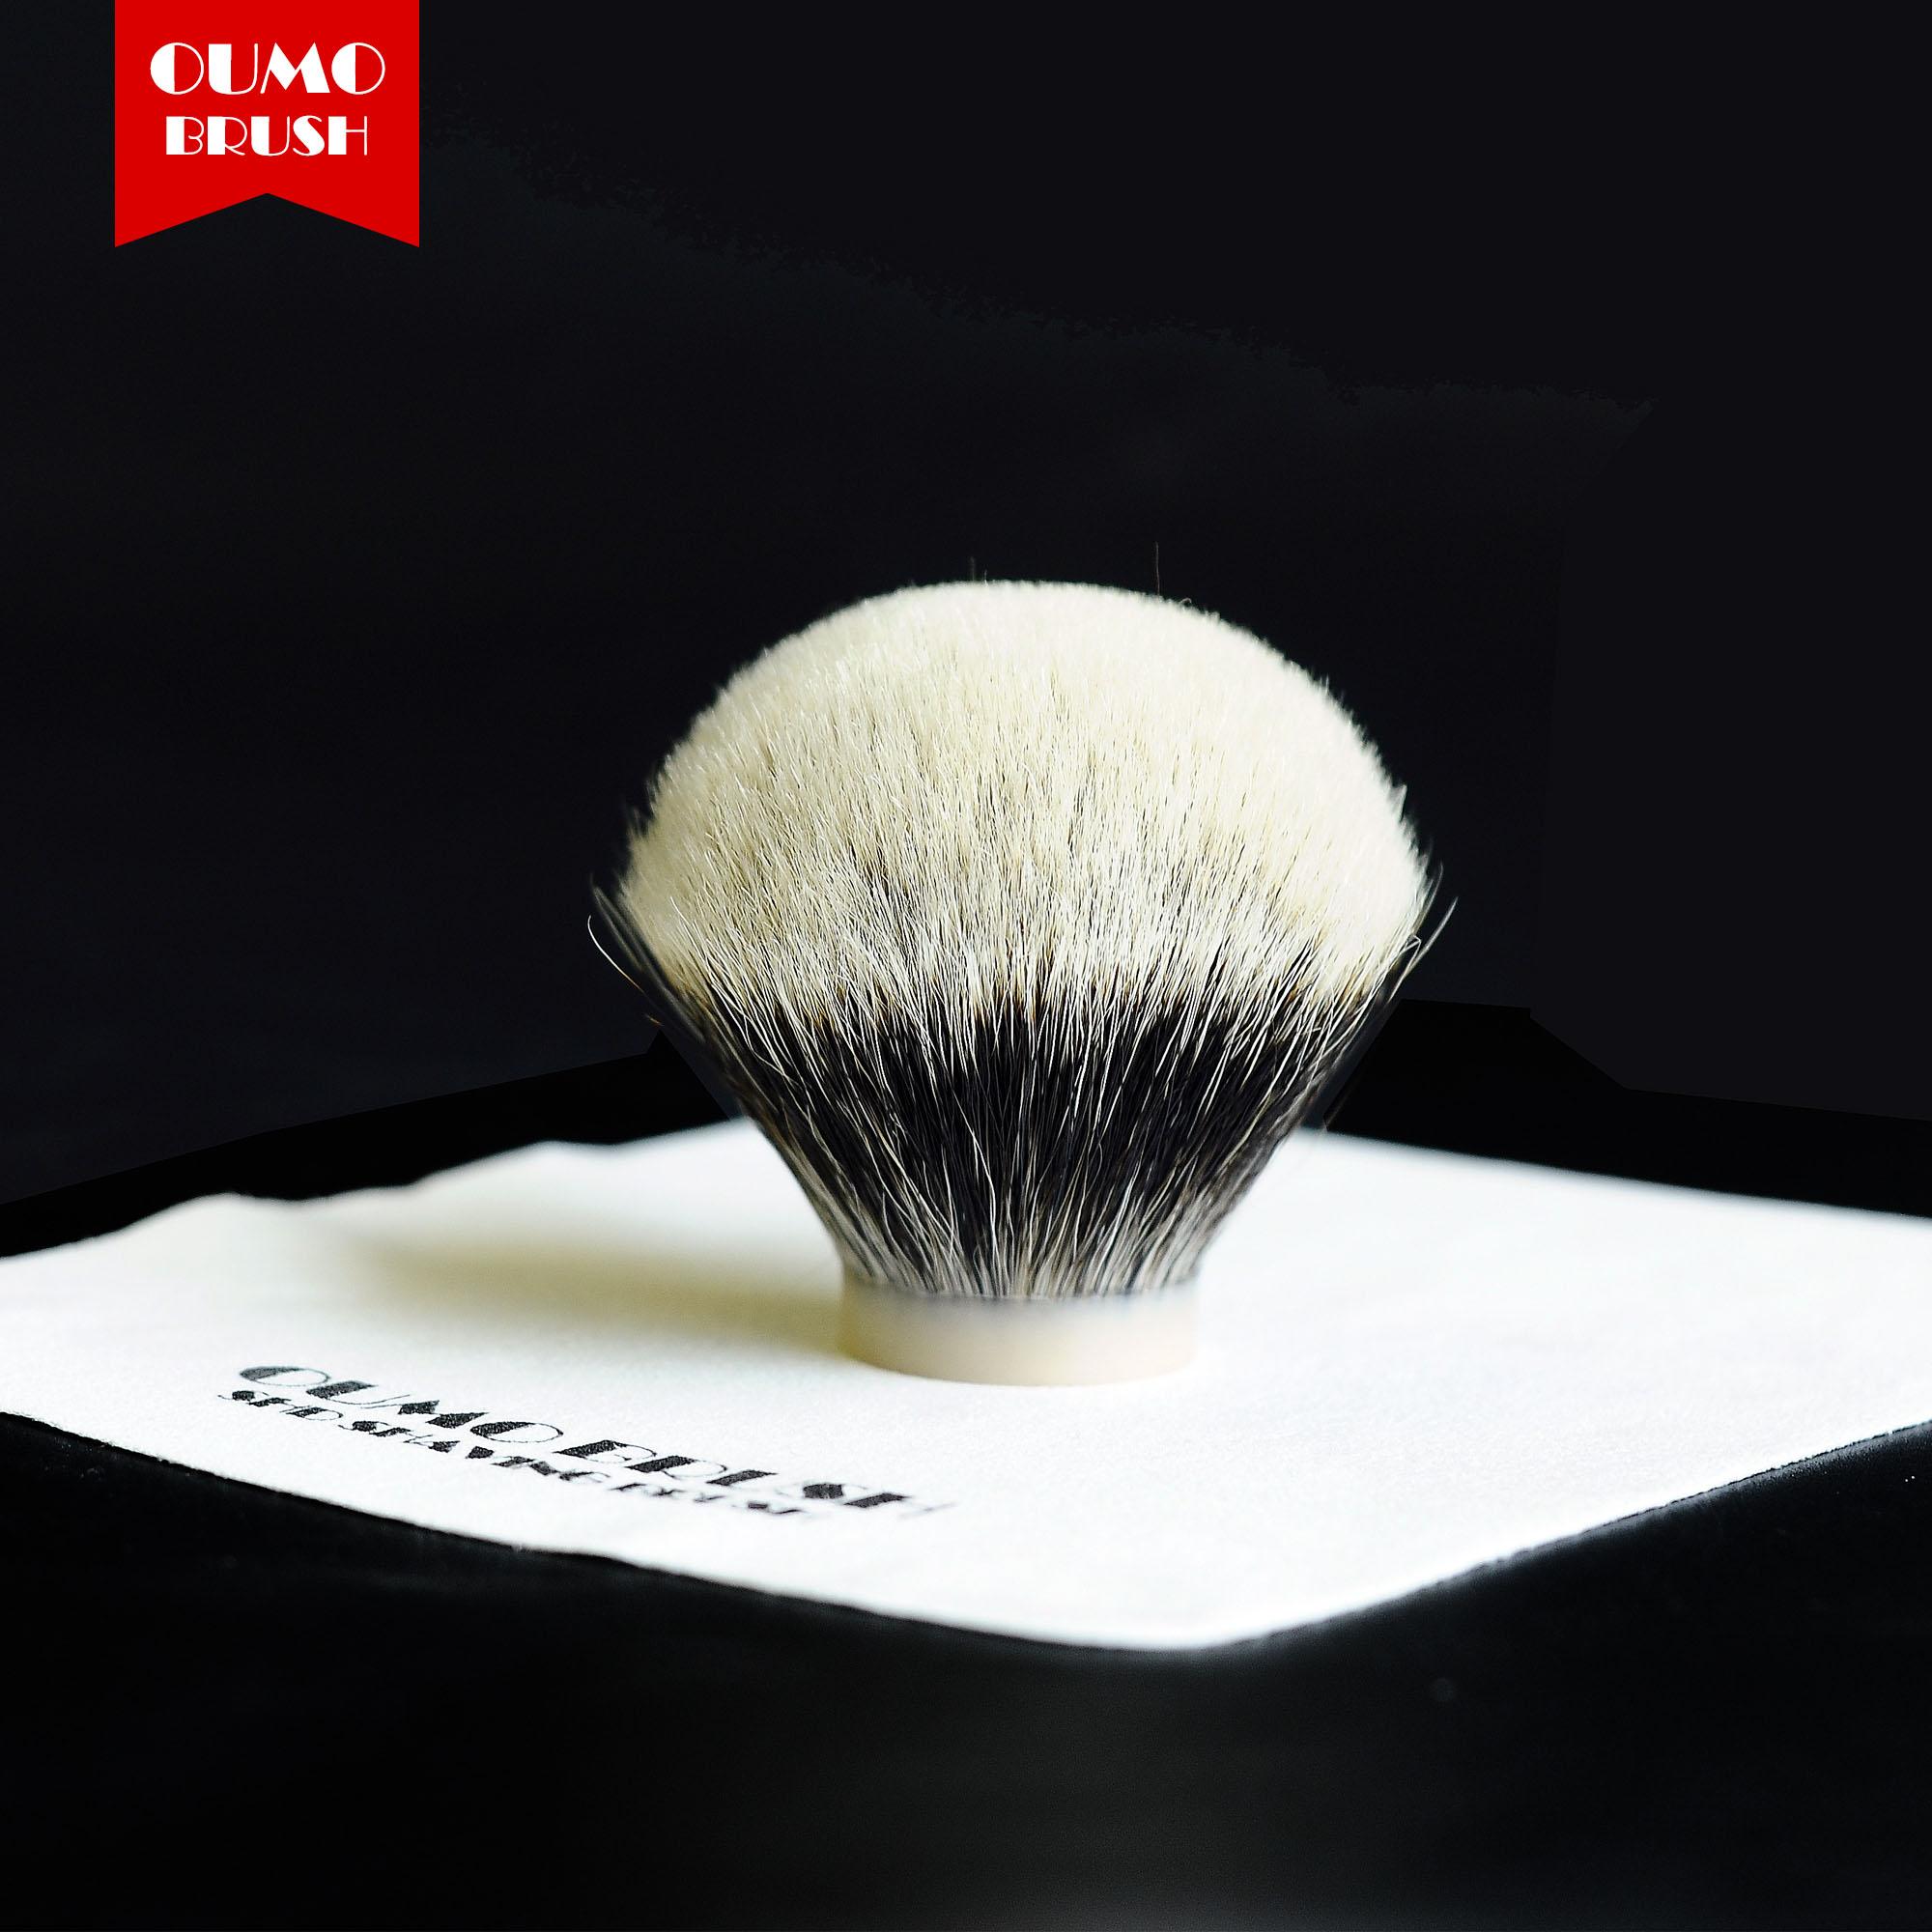 OUMO BRUSH-  SHD Manchuria Finest2 Band Chubby Bulb Badger Hair Knots  Shaving Brush Knots